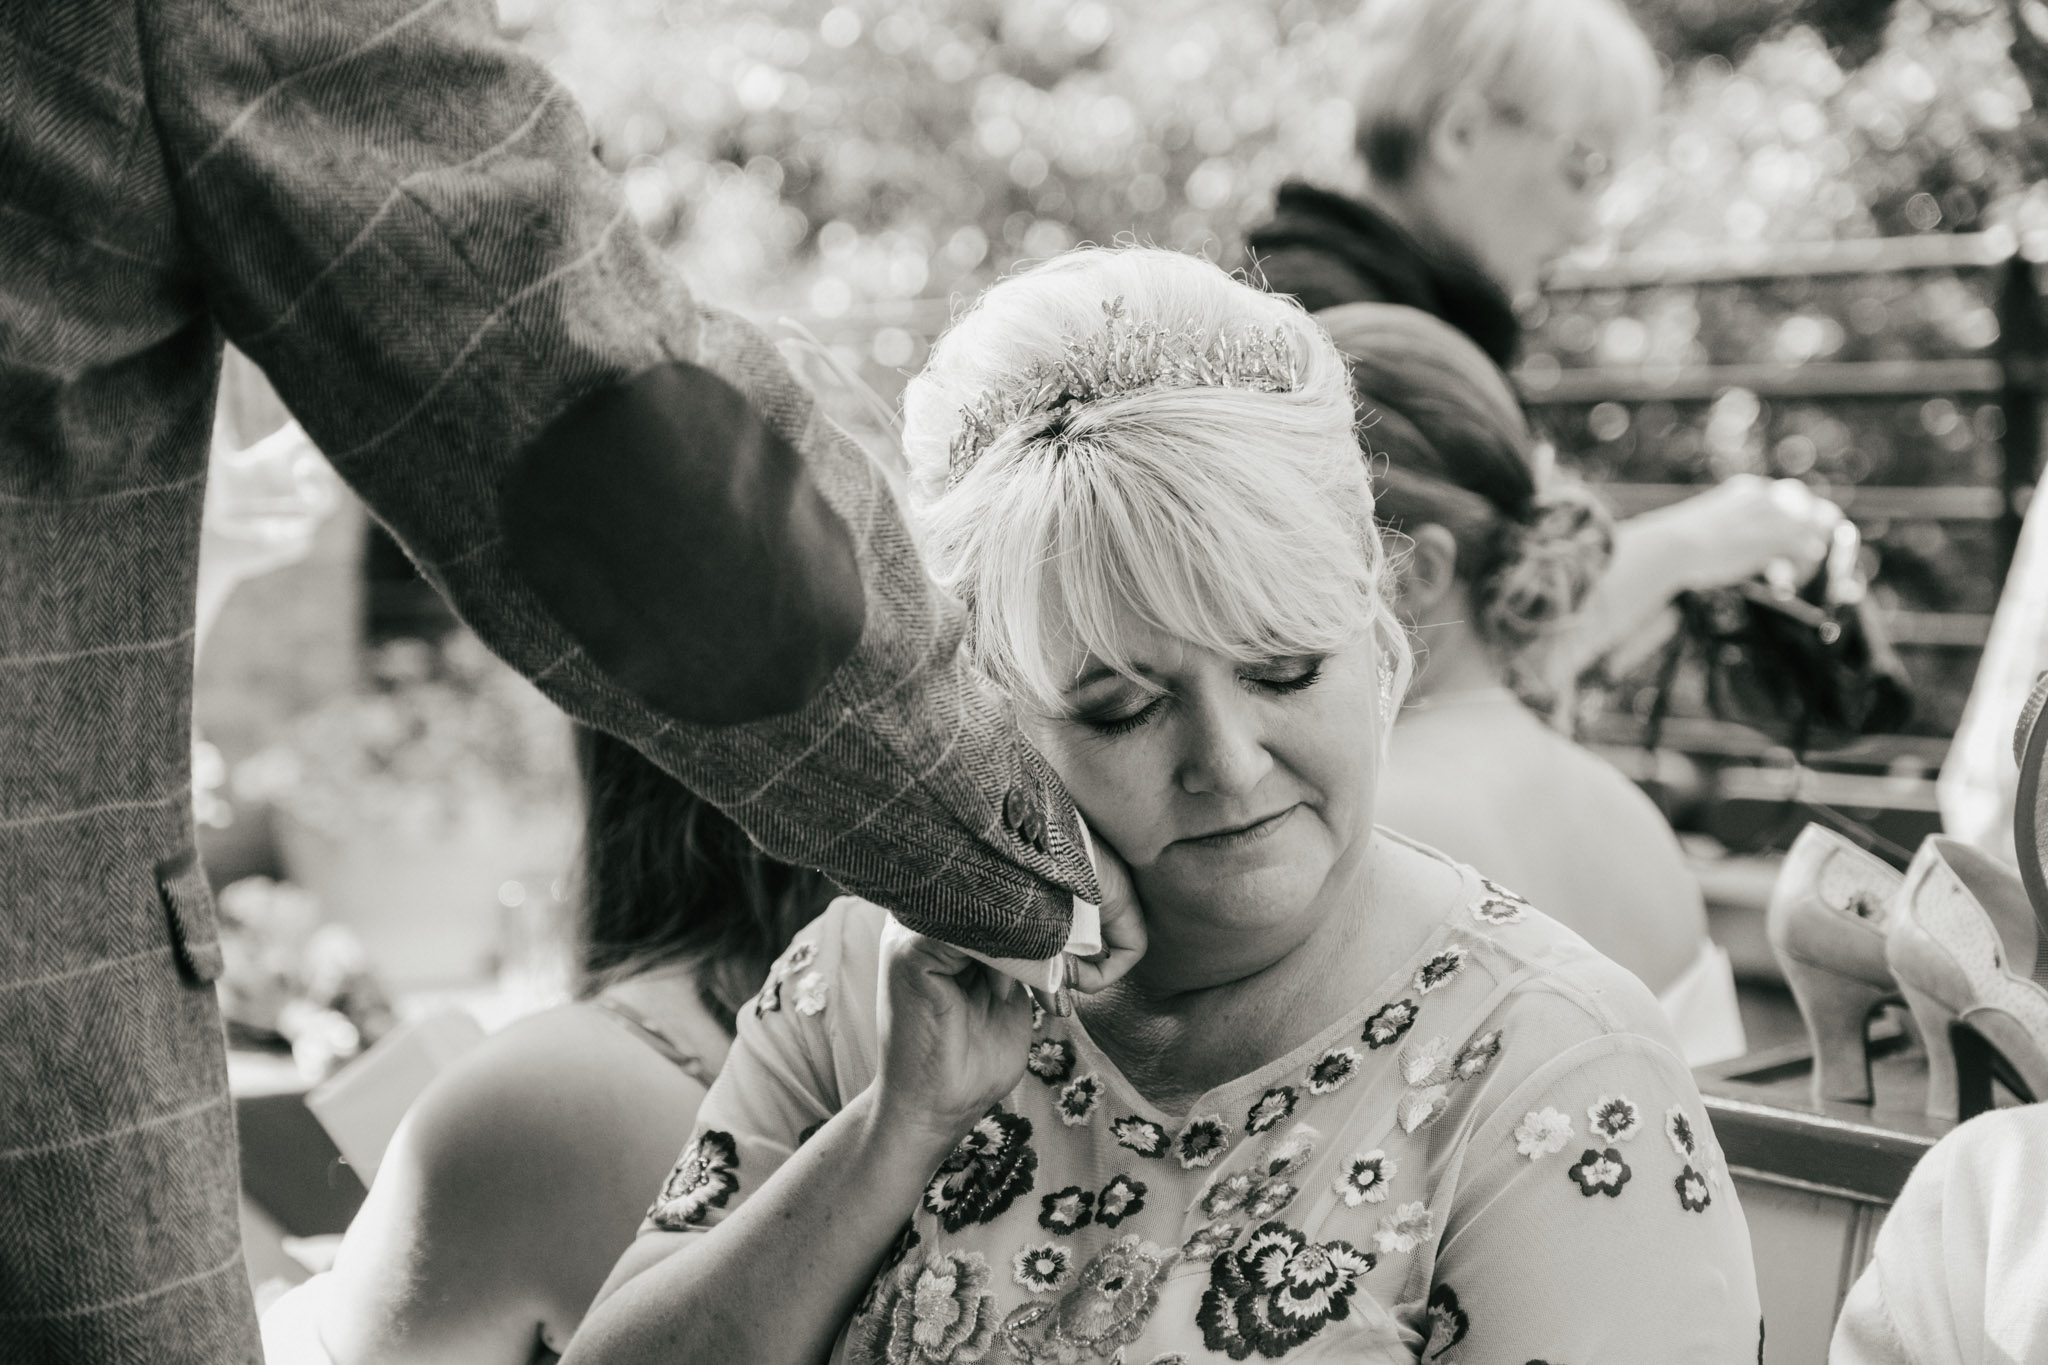 Aaron Jeffels Photography | Wedding Photographer based in Guisborough | Wedding photography North Yorkshire